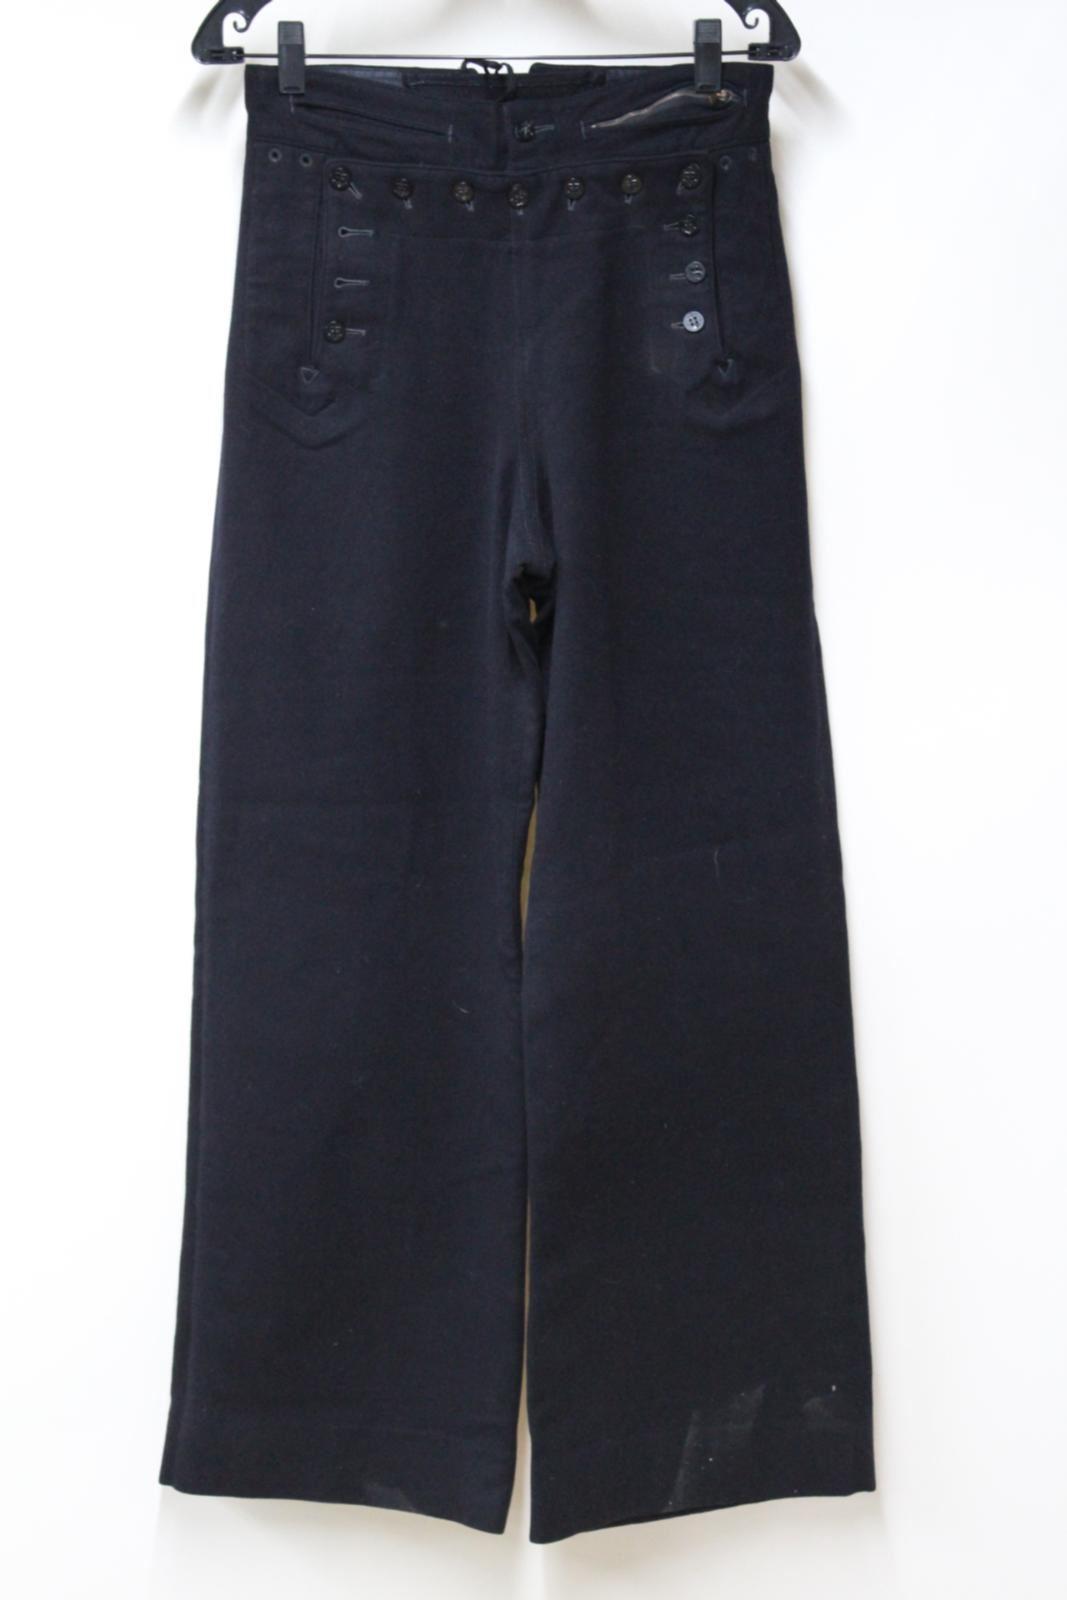 NAVAL CLOTHING FACTORY US Navy Sailor Uniform 13 Button High Waist Trousers W28